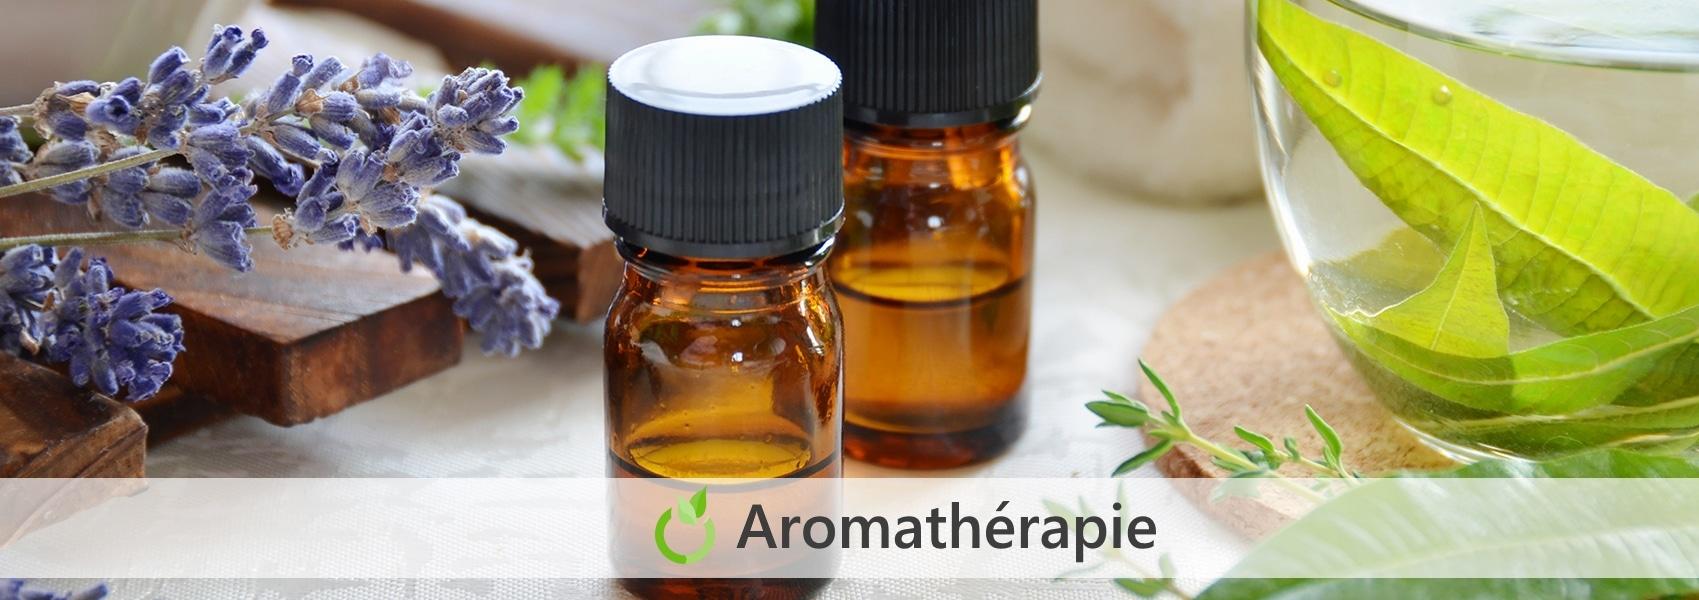 aromatéhrapie en pharmacie à Canteleu portail